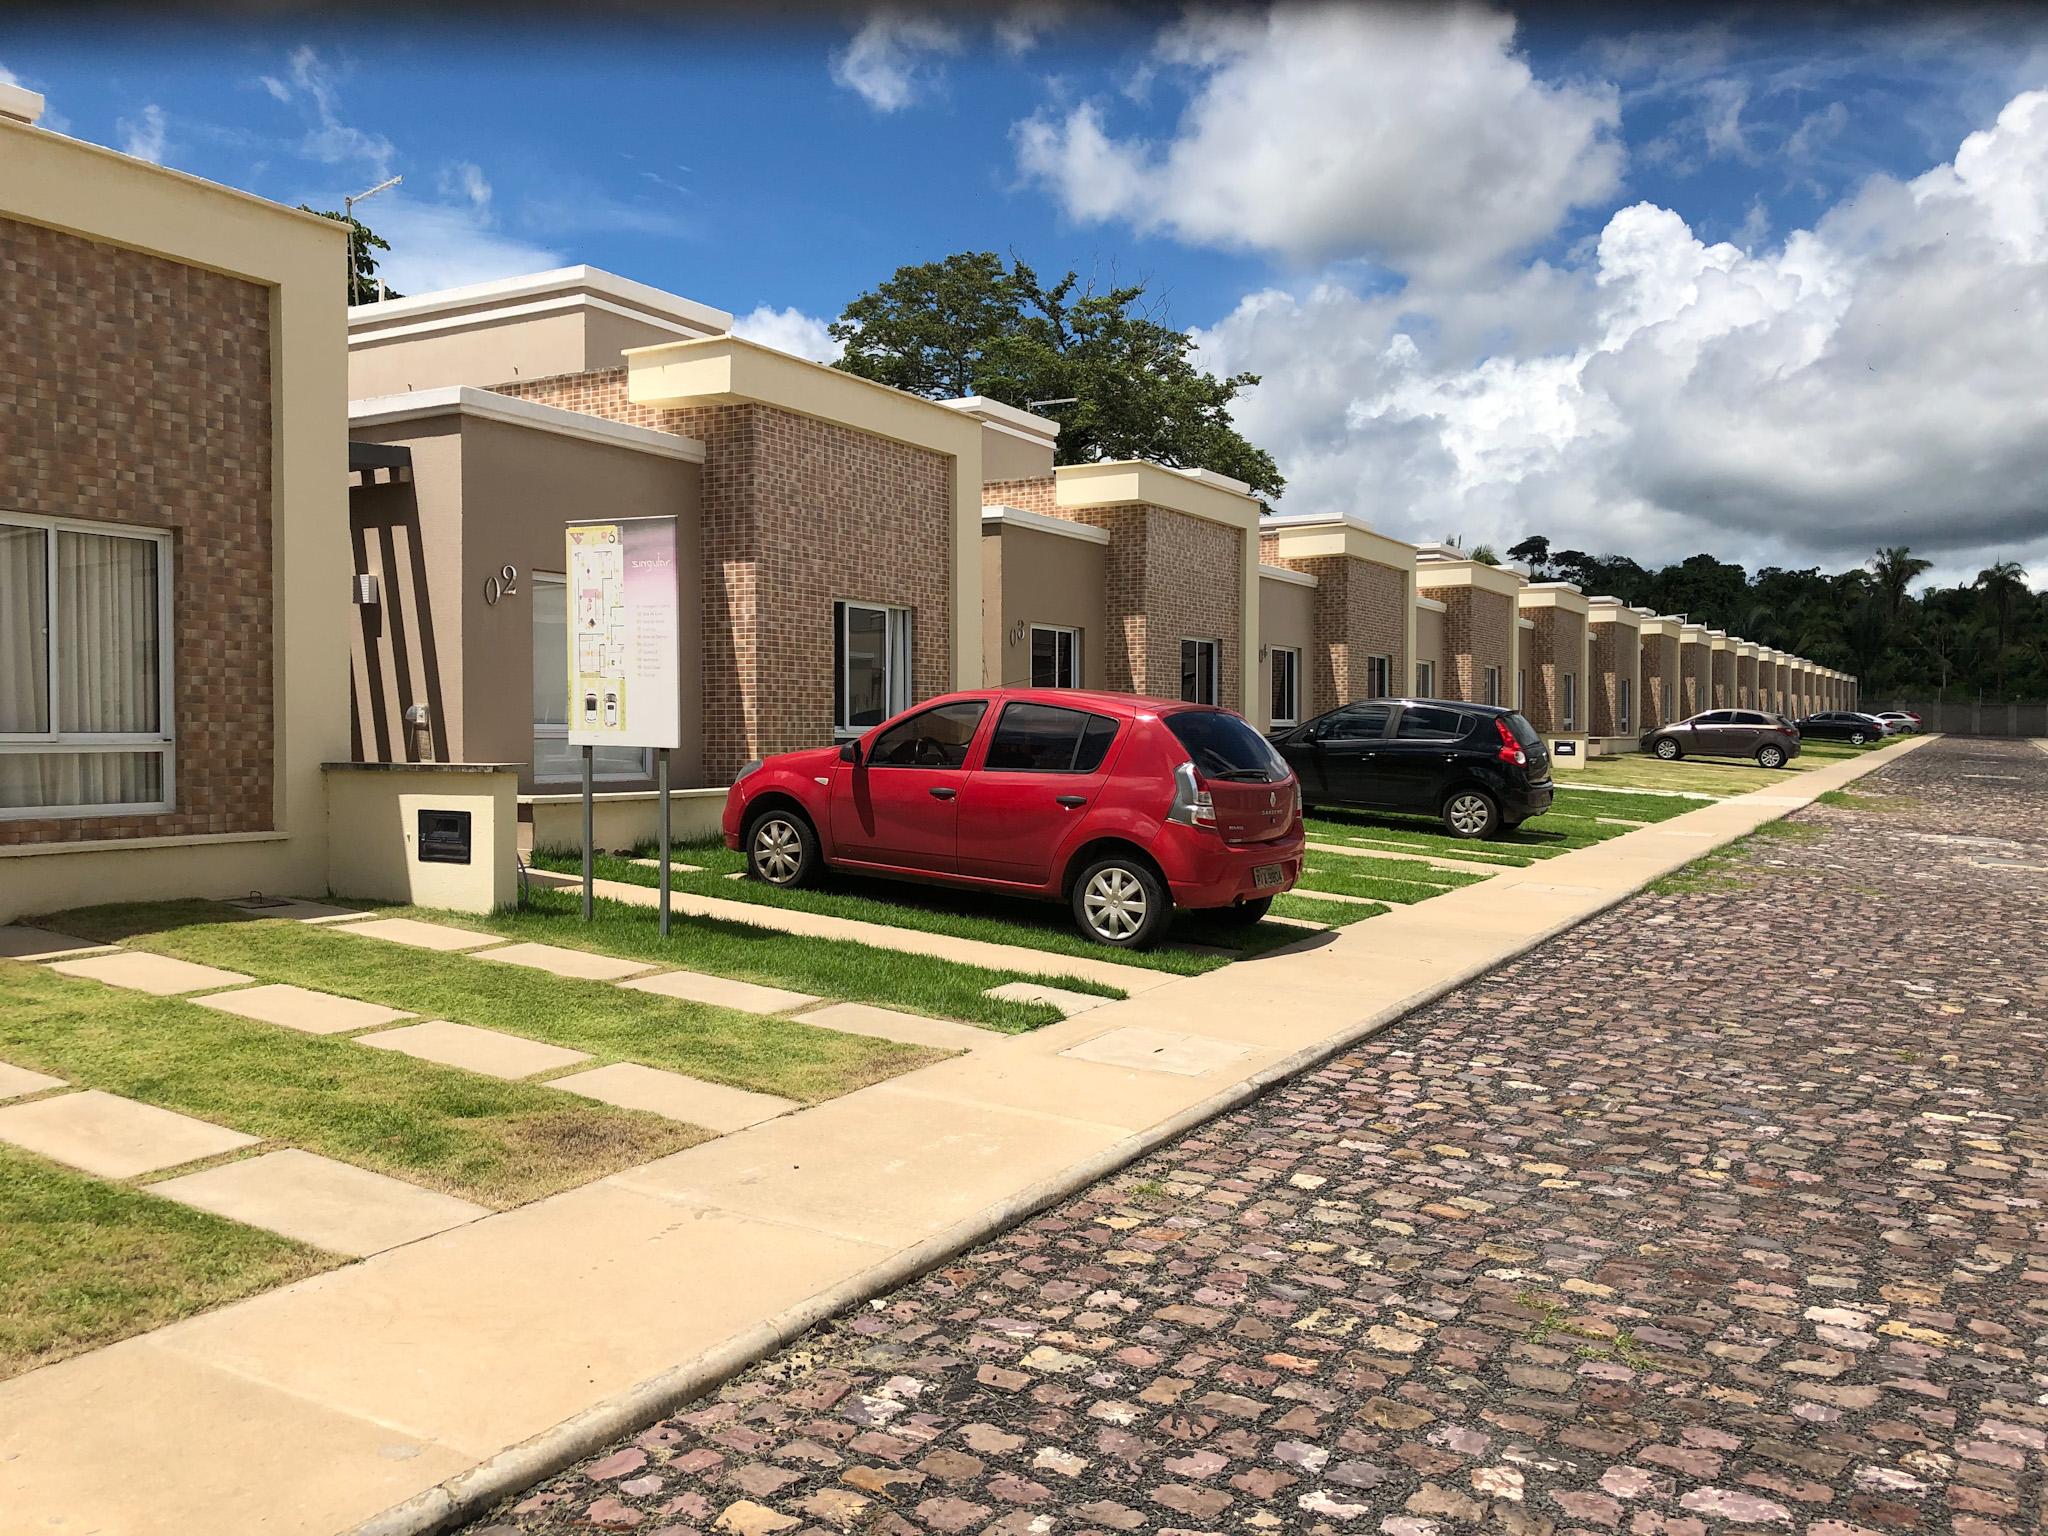 Condomínio Singular Teresina casas com 3 quartos sendo 1 suíte ,Zona leste